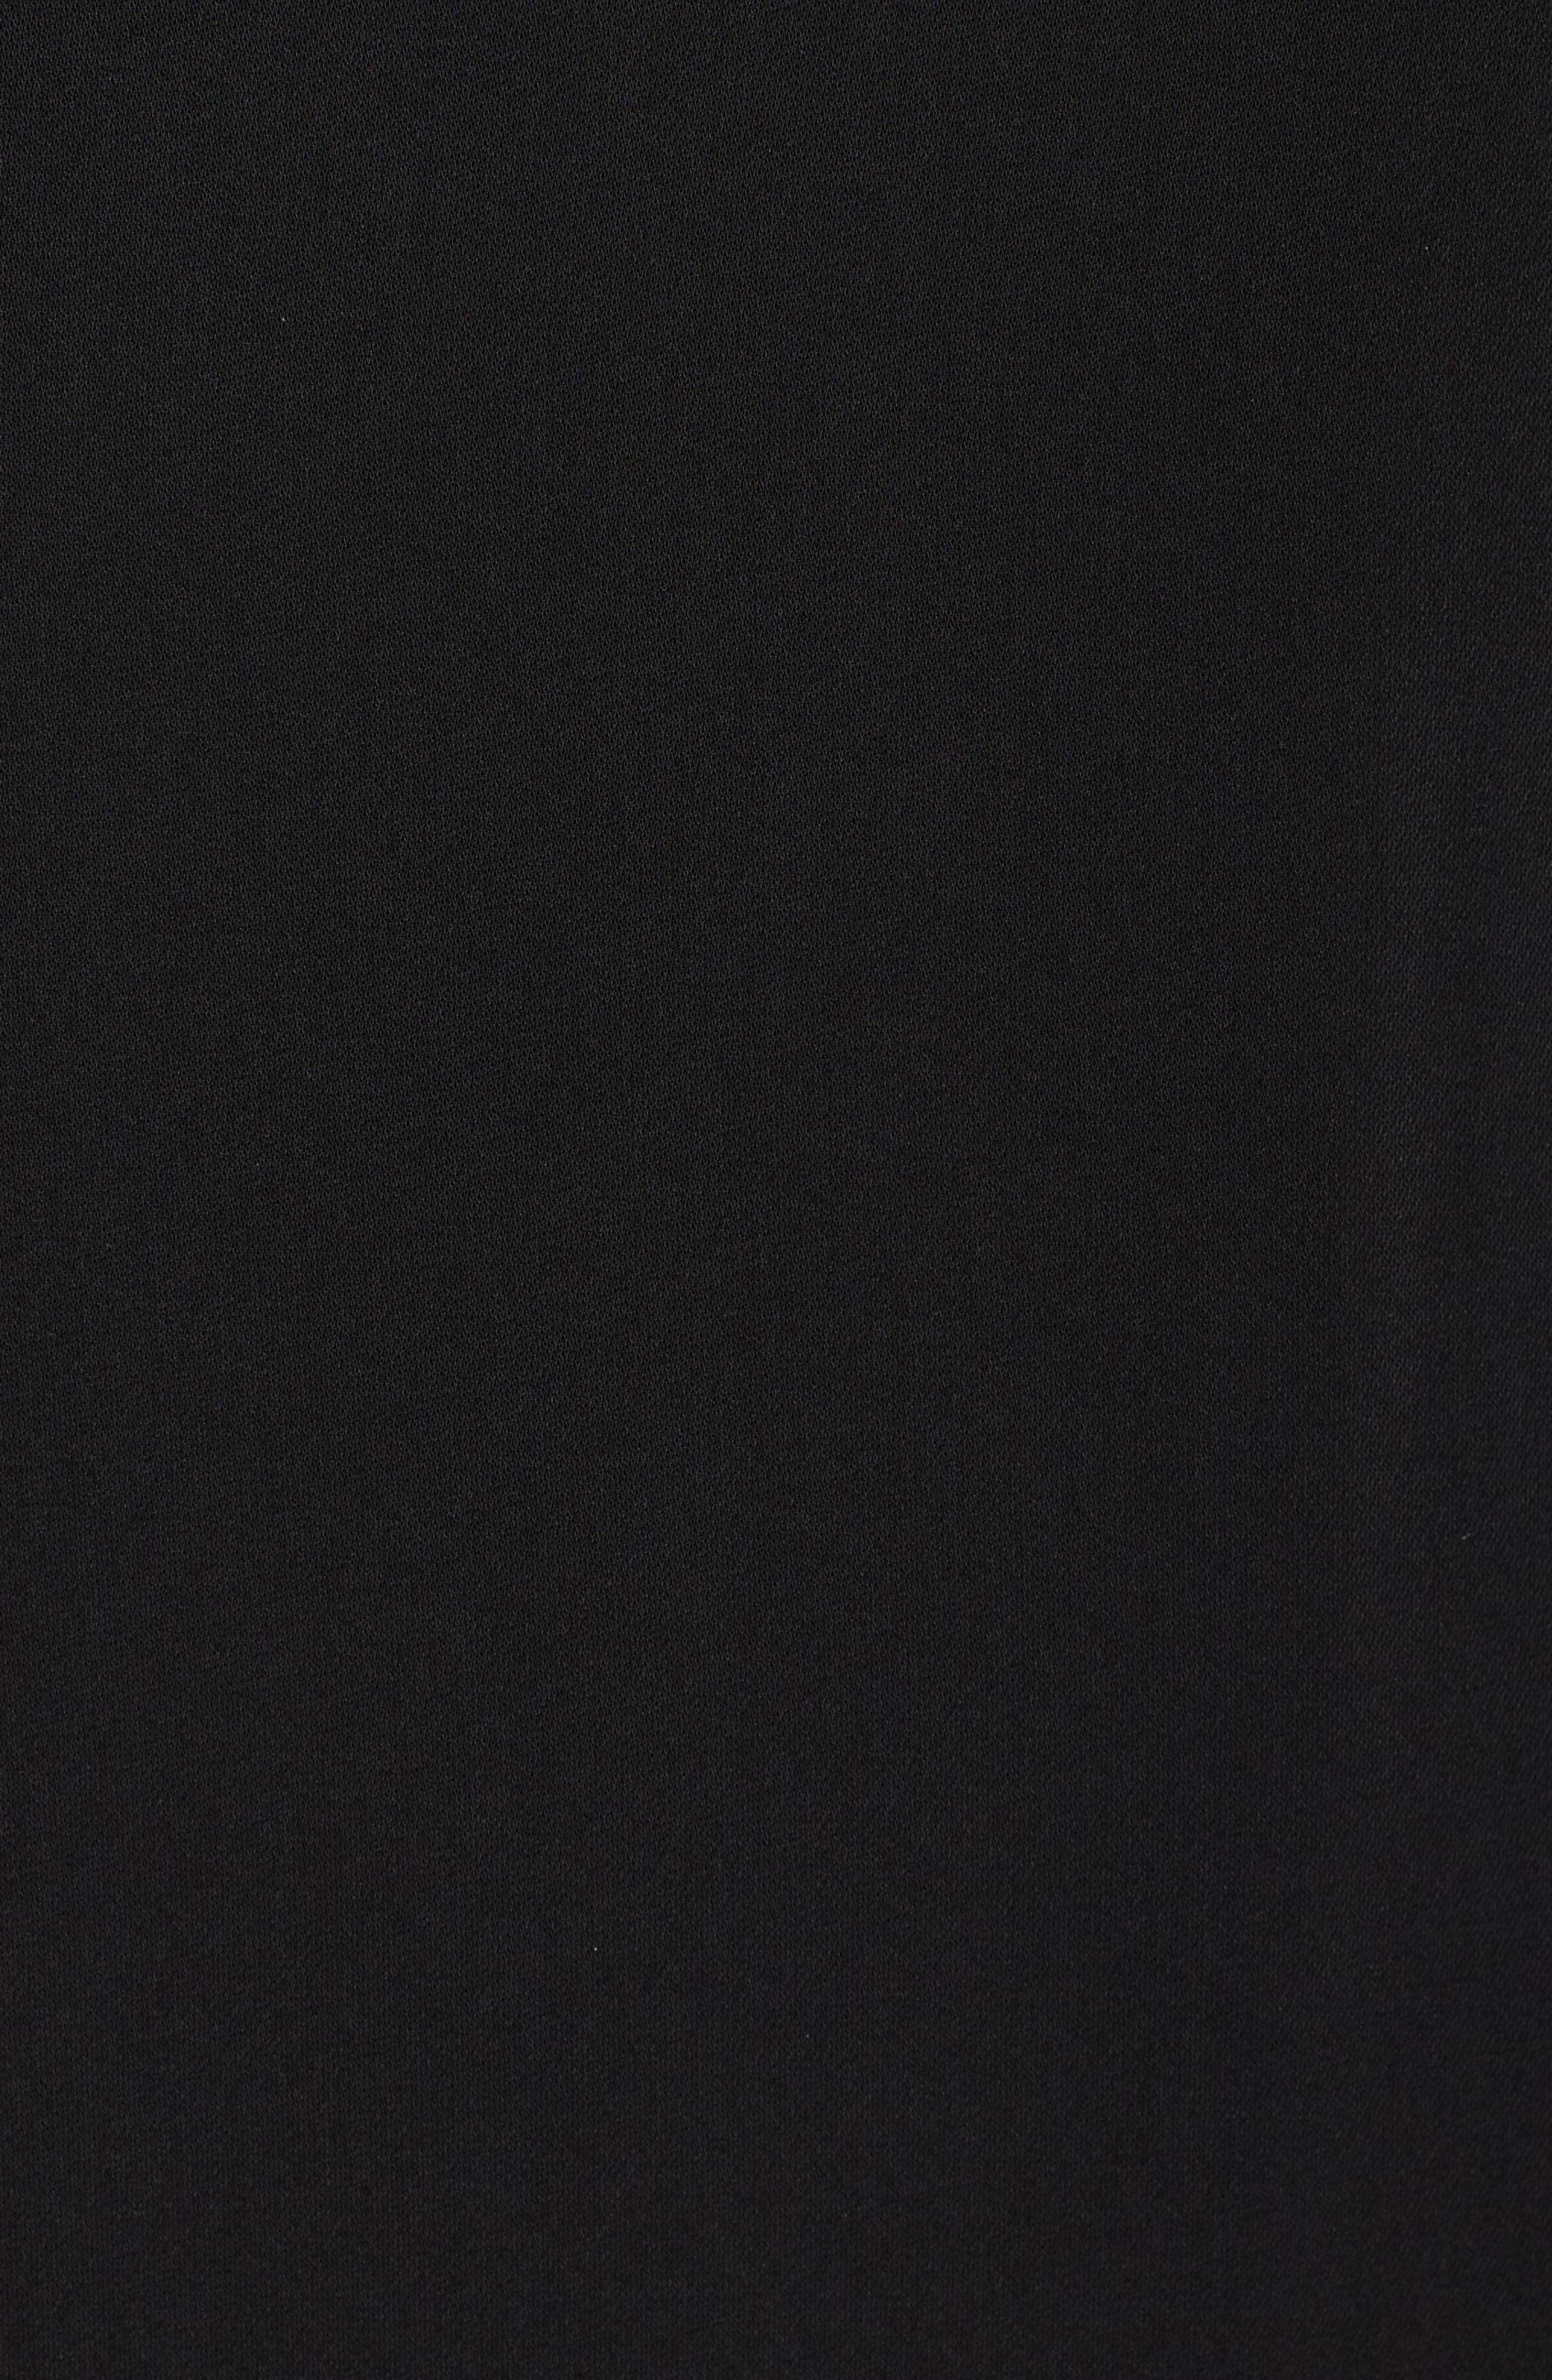 Sherryl Ruffle Sleeve Shift Dress,                             Alternate thumbnail 5, color,                             Black